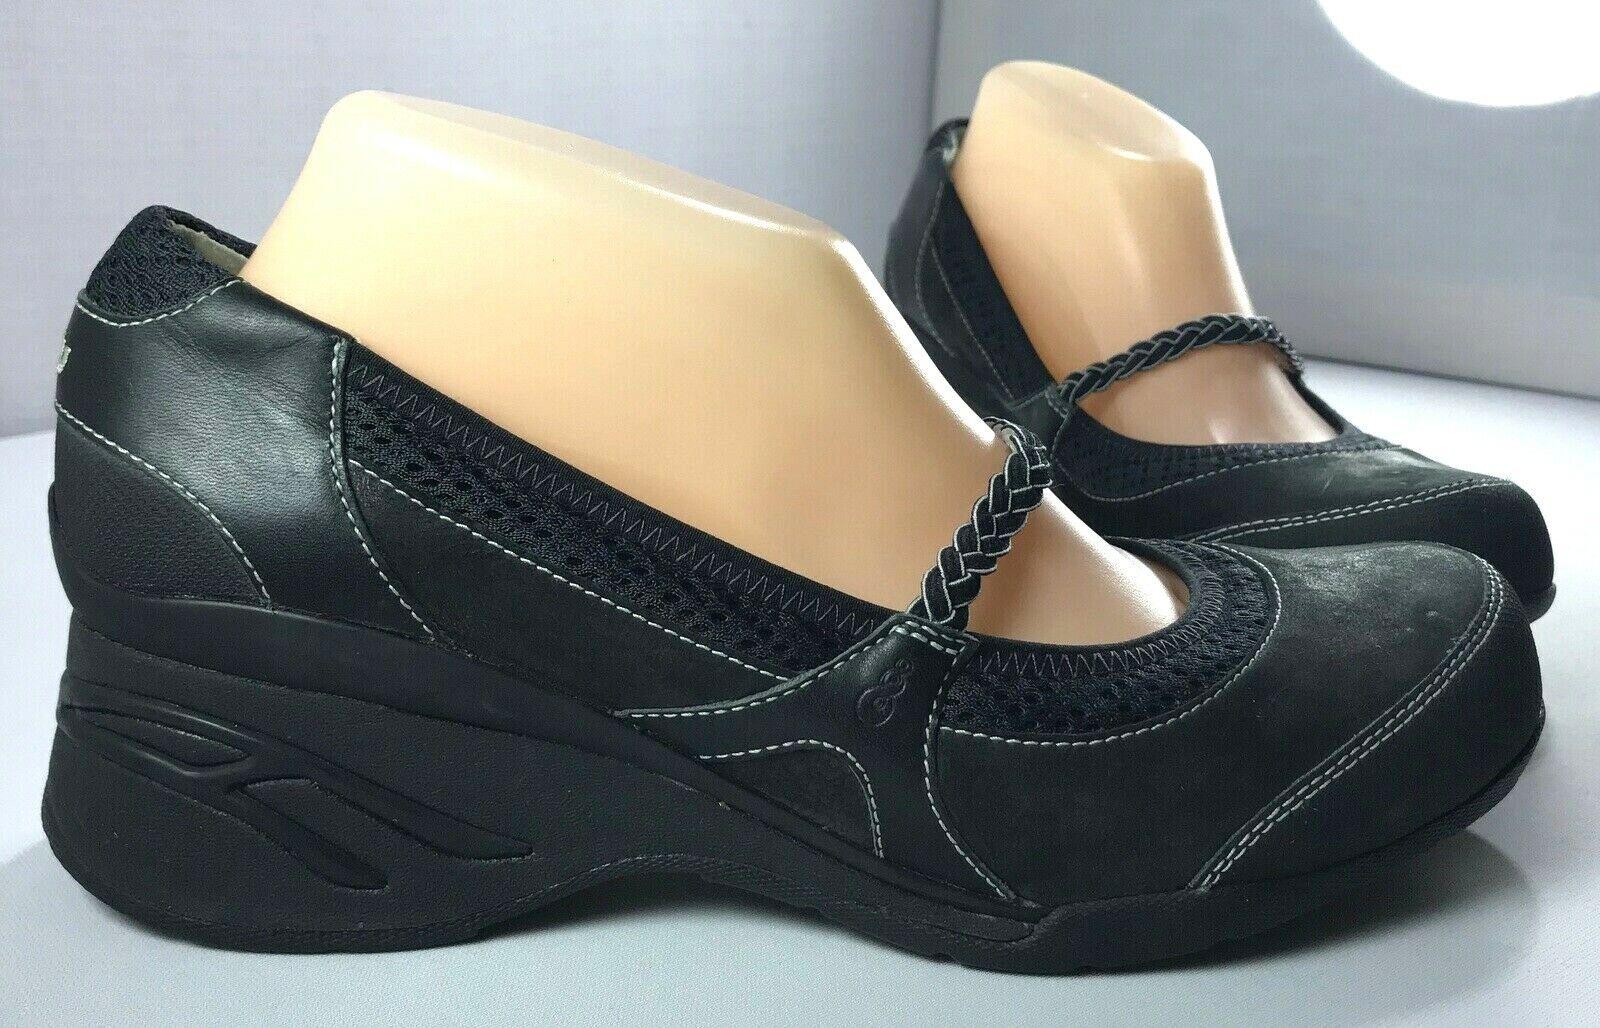 Ahnu Olivia Womens Mary Jane Shoes Black Leather Wedge Size 10